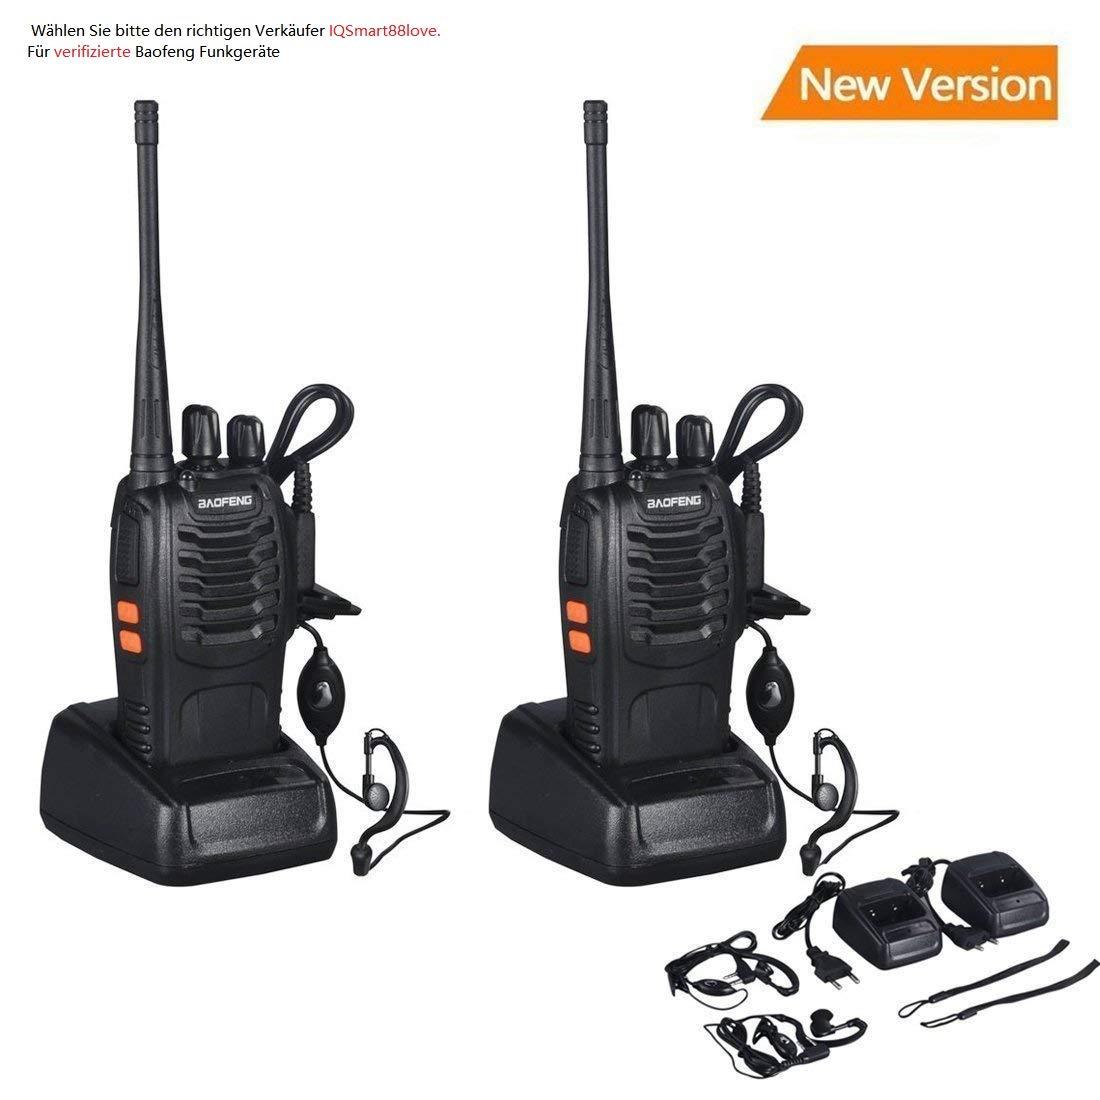 Baofeng BF-888S Talkie walkie UHF Radio bidirectionnelle portative